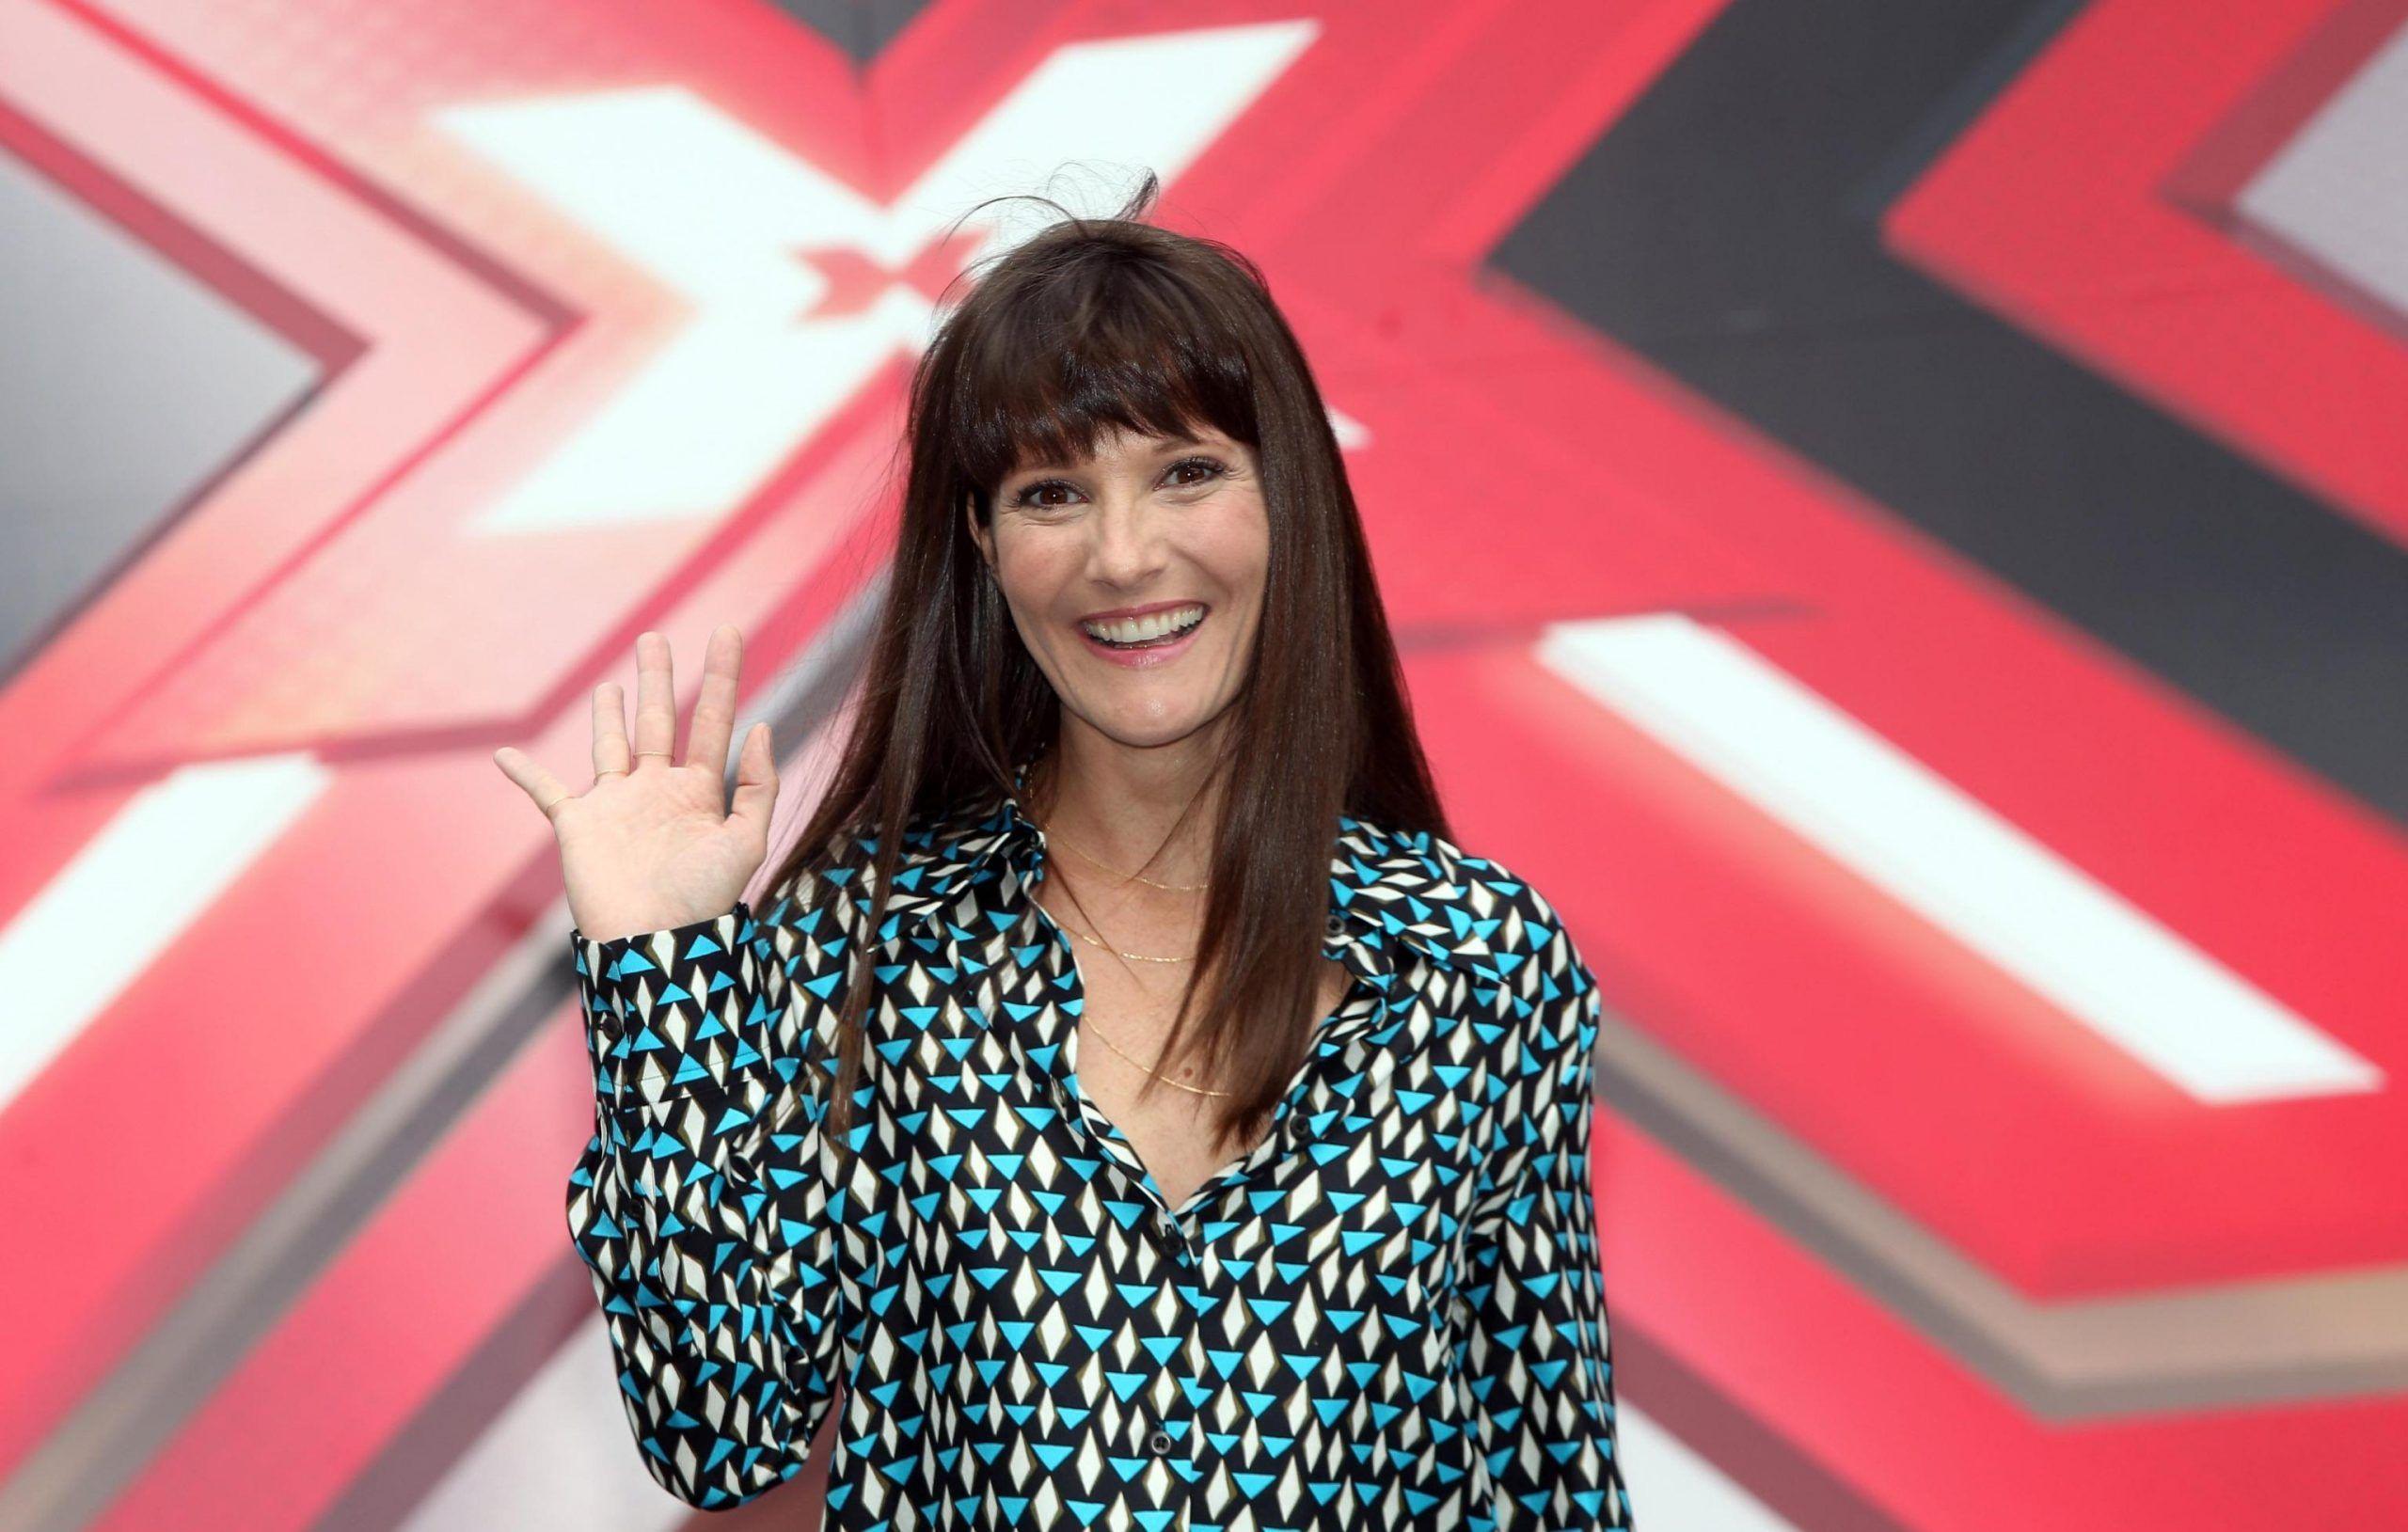 Conferenza stampa di presentazione di 'X Factor 2014'